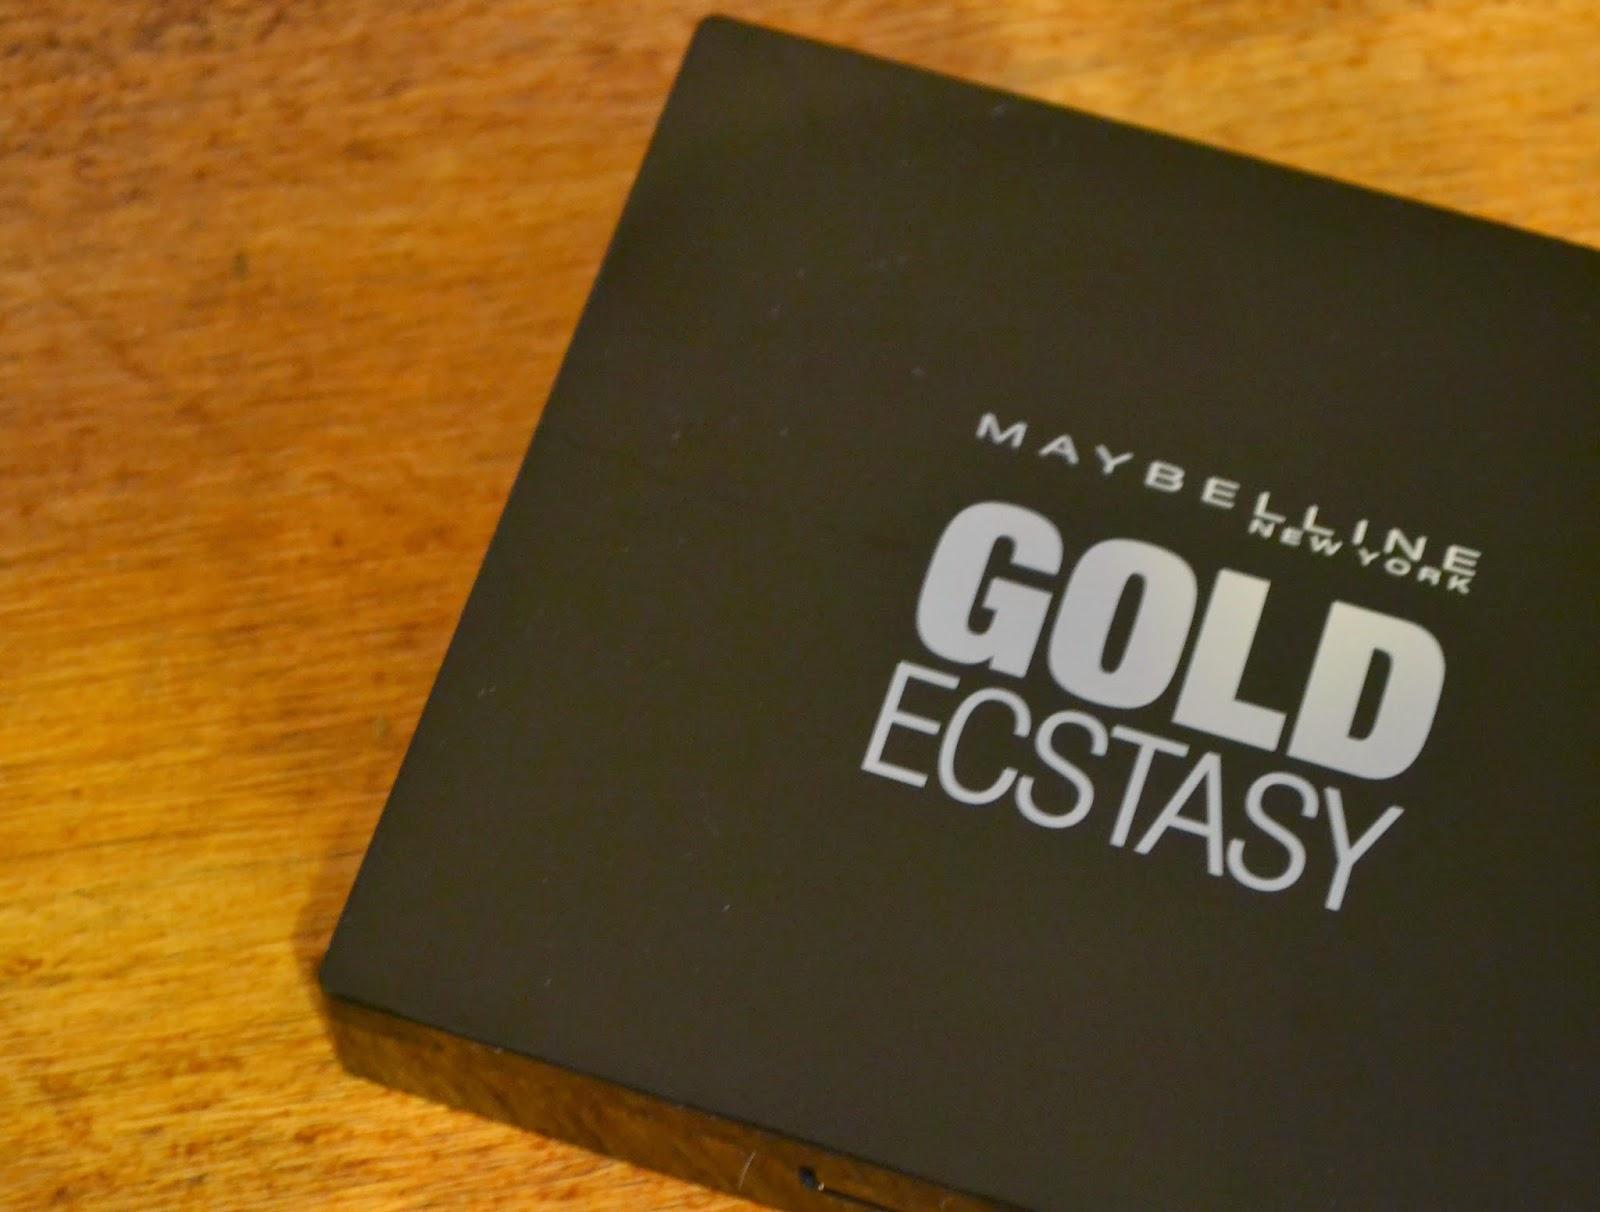 Paleta Gold Ecstasy de Maybelline